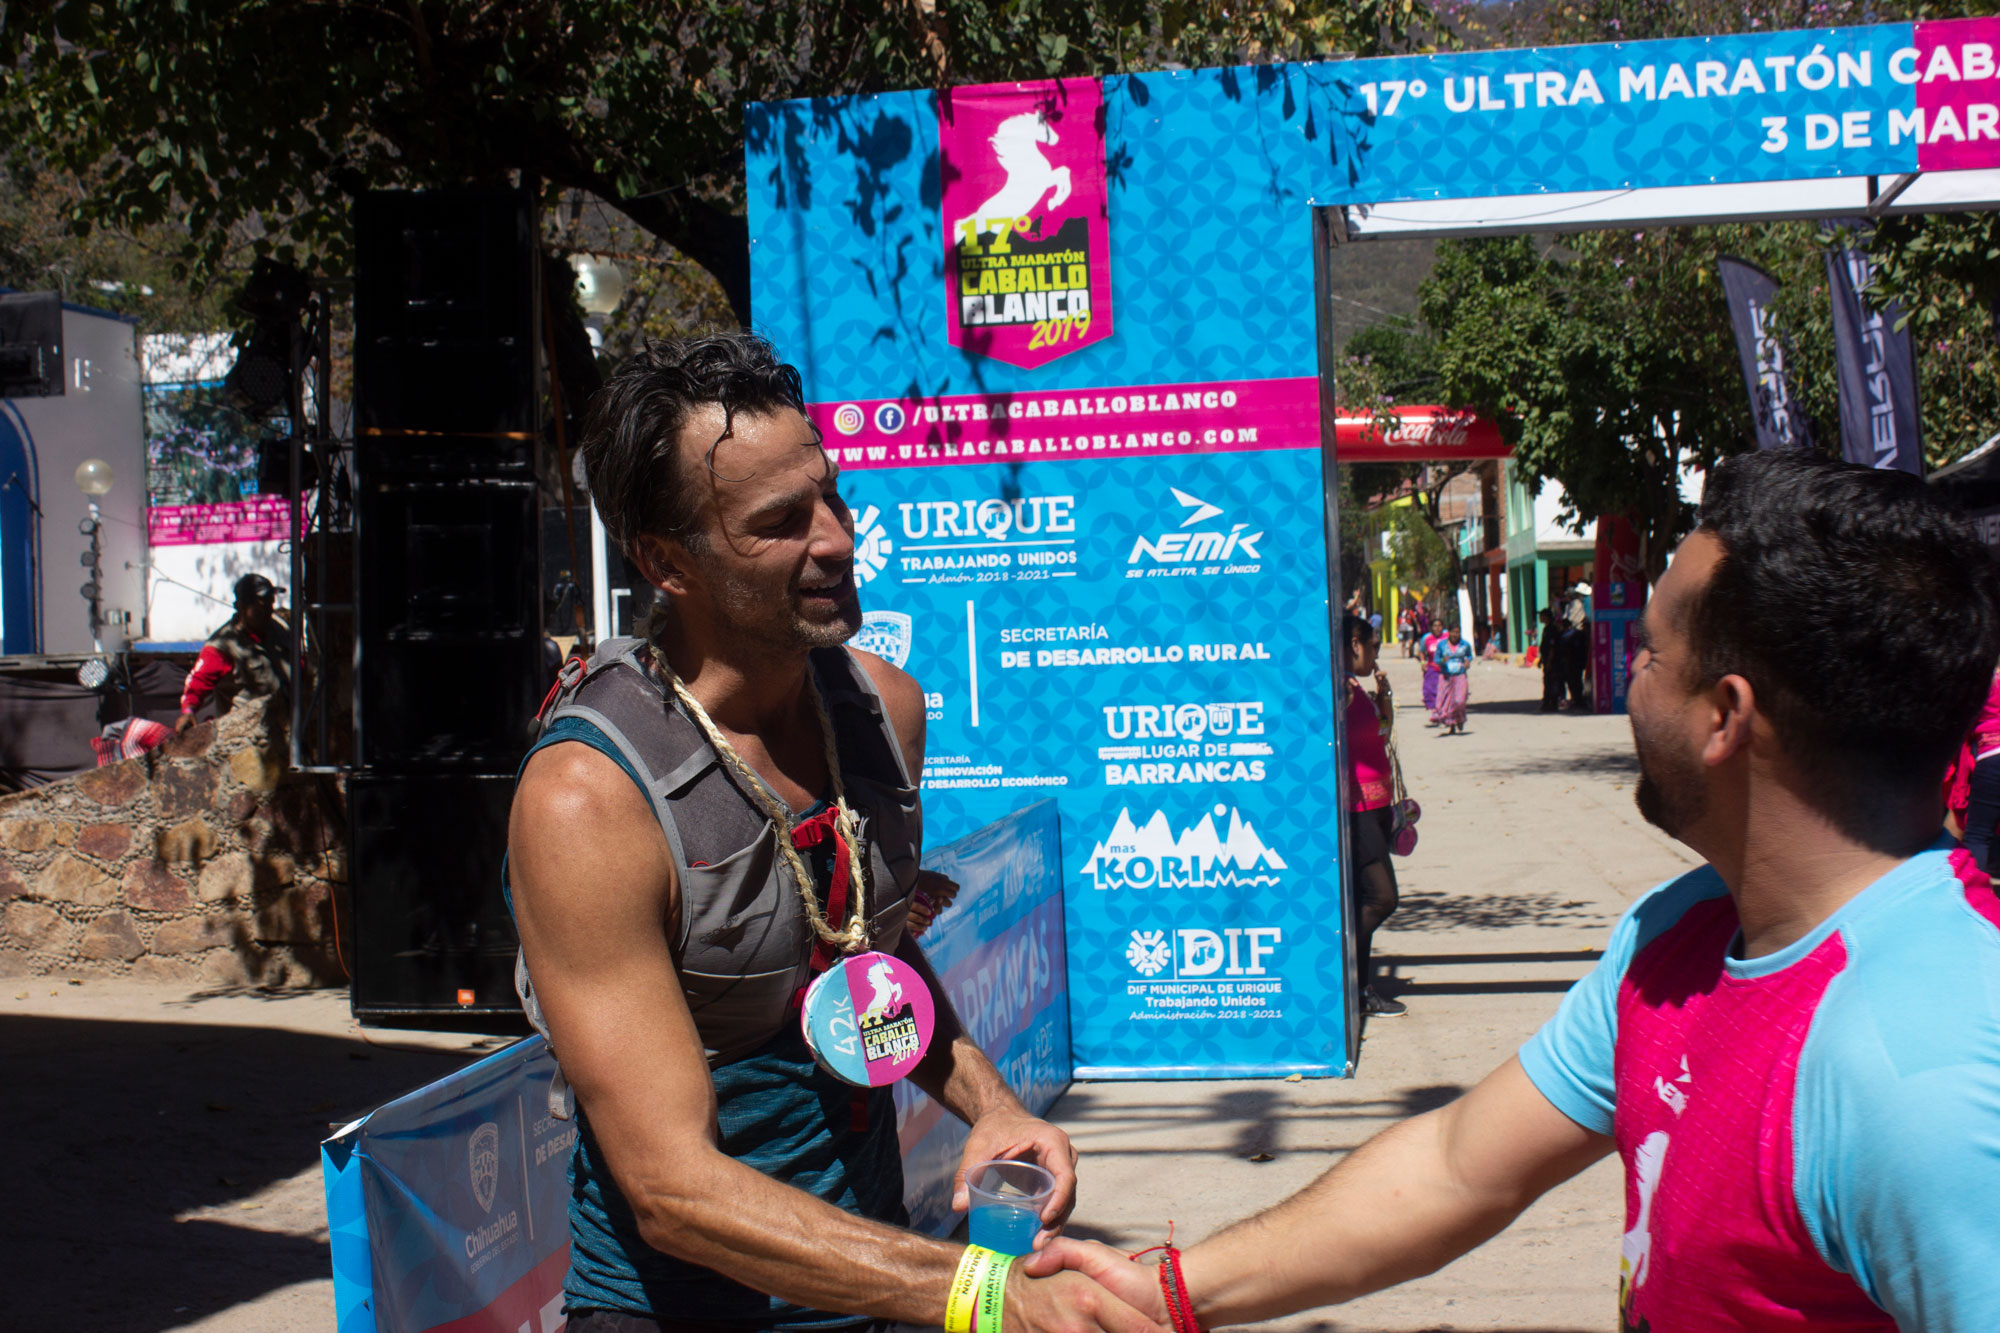 Ryan Young Completes Marathon